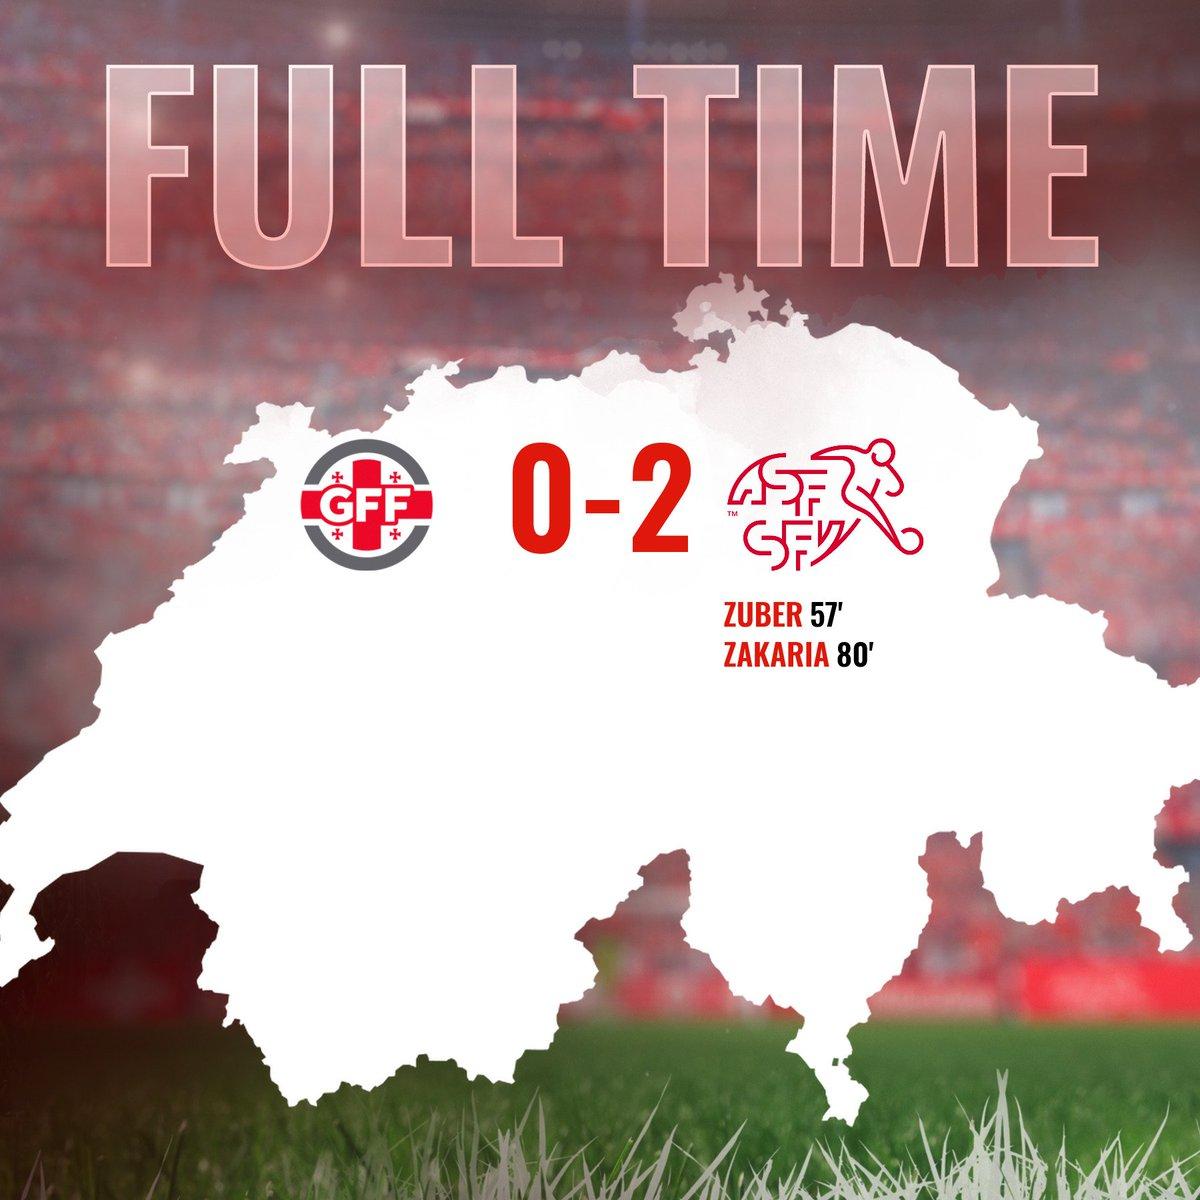 Die Schweiz gewinnt in Georgien mit 2:0 La Suisse s'impose 2:0 en Géorgie La Svizzera vince 2:0 in Georgia  #GEOSUI #EURO2020 🇨🇭⚽️💪 #HoppSchwiiz #HopSuisse #ForzaSvizzera #HopSvizra